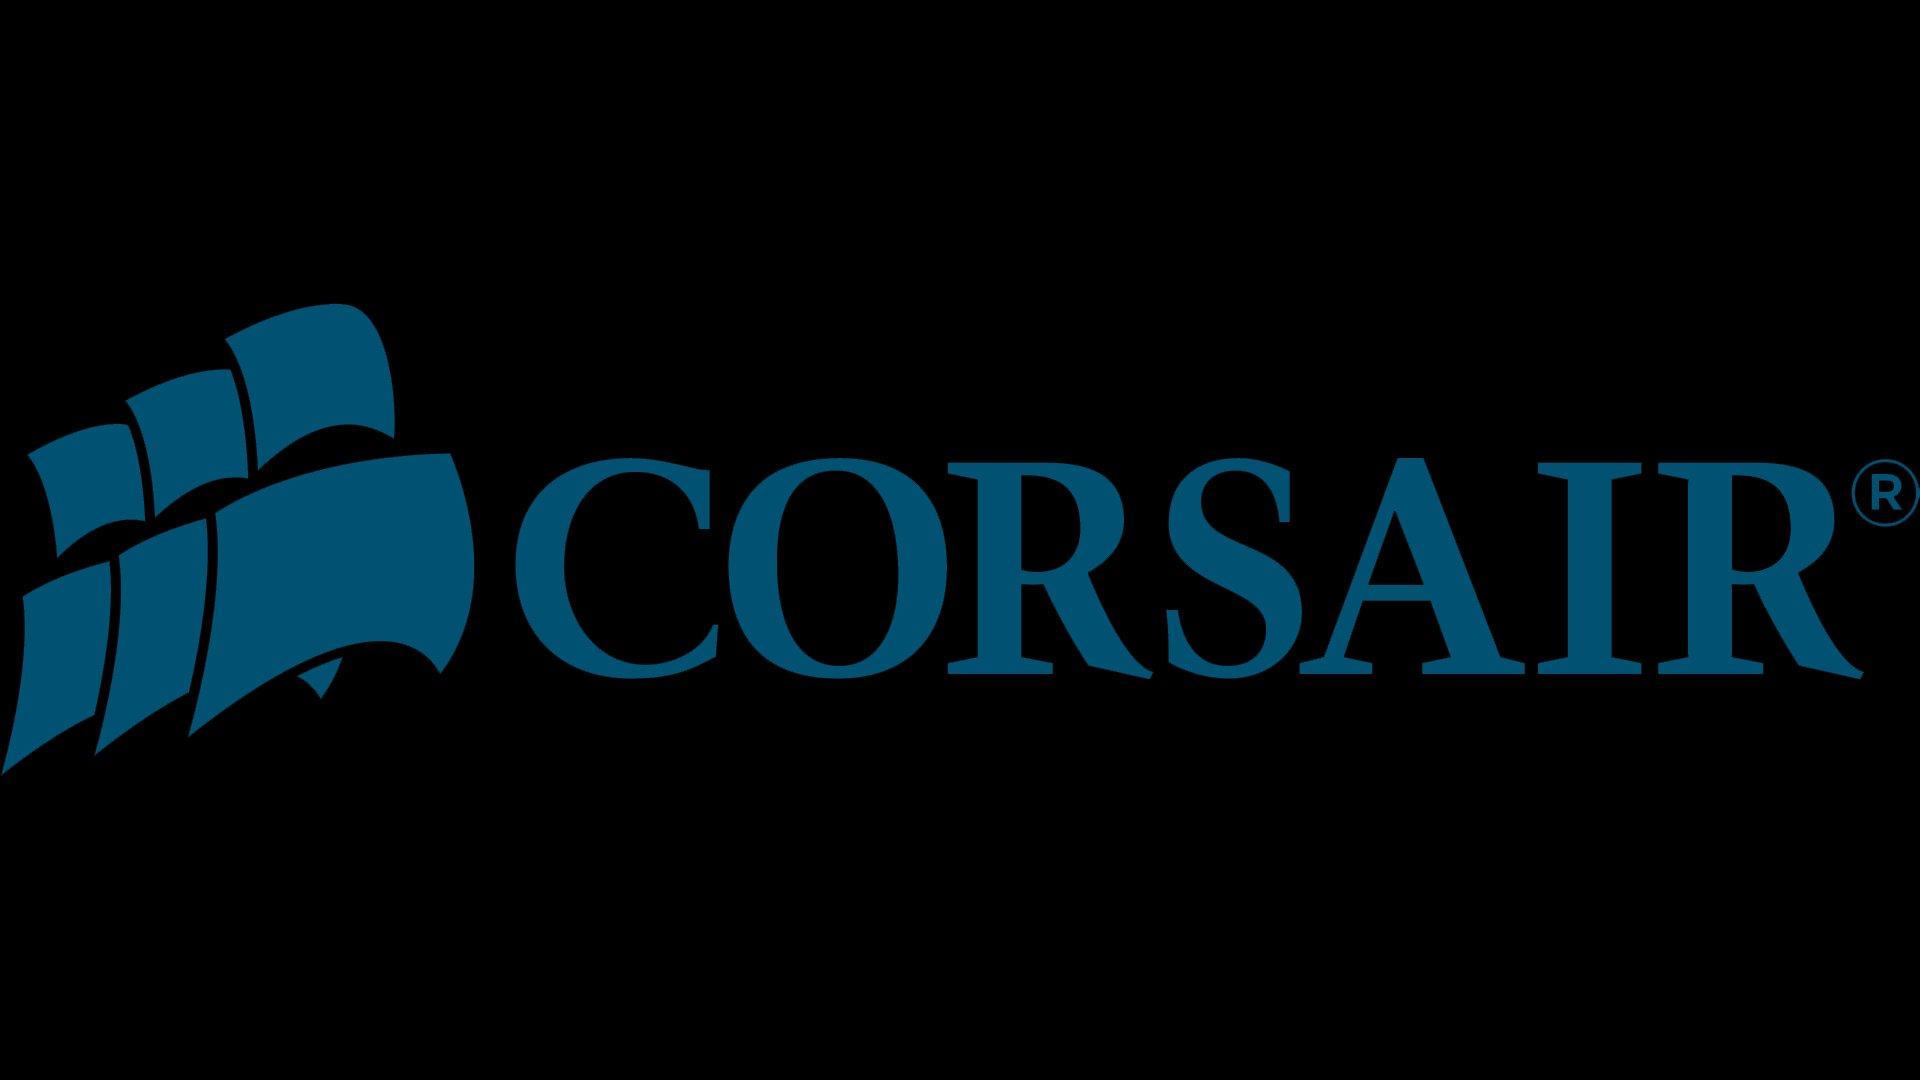 Download 1920x1080 corsair logo for Corsair wallpaper 4k